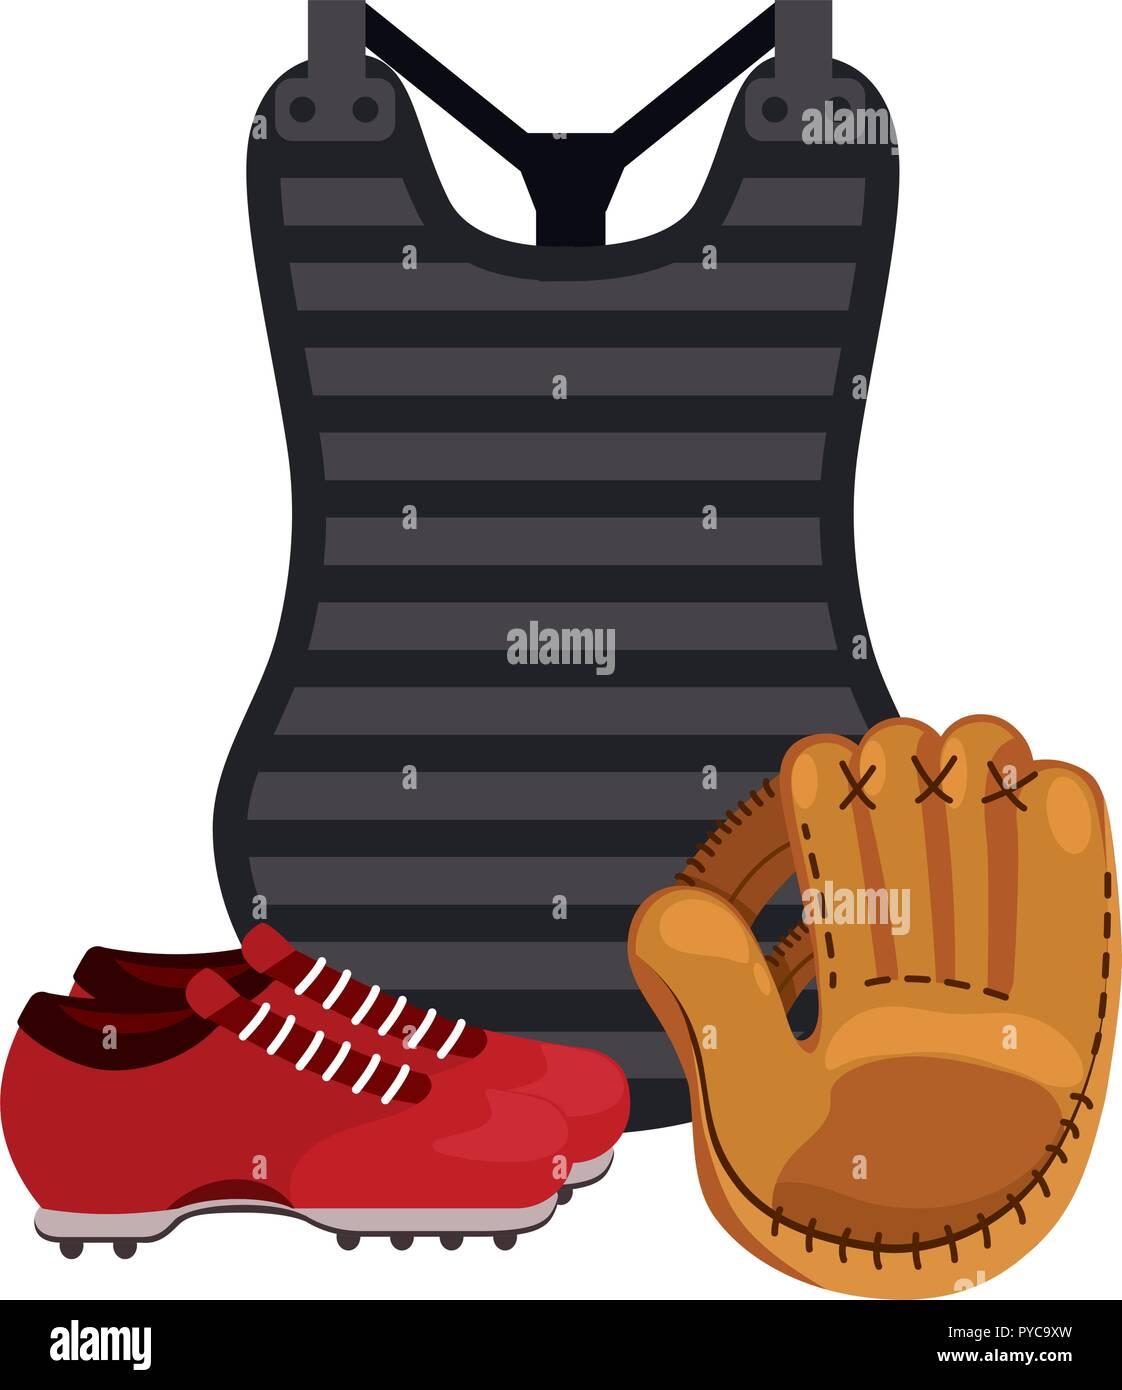 Shoe Protector Stockfotos & Shoe Protector Bilder Alamy